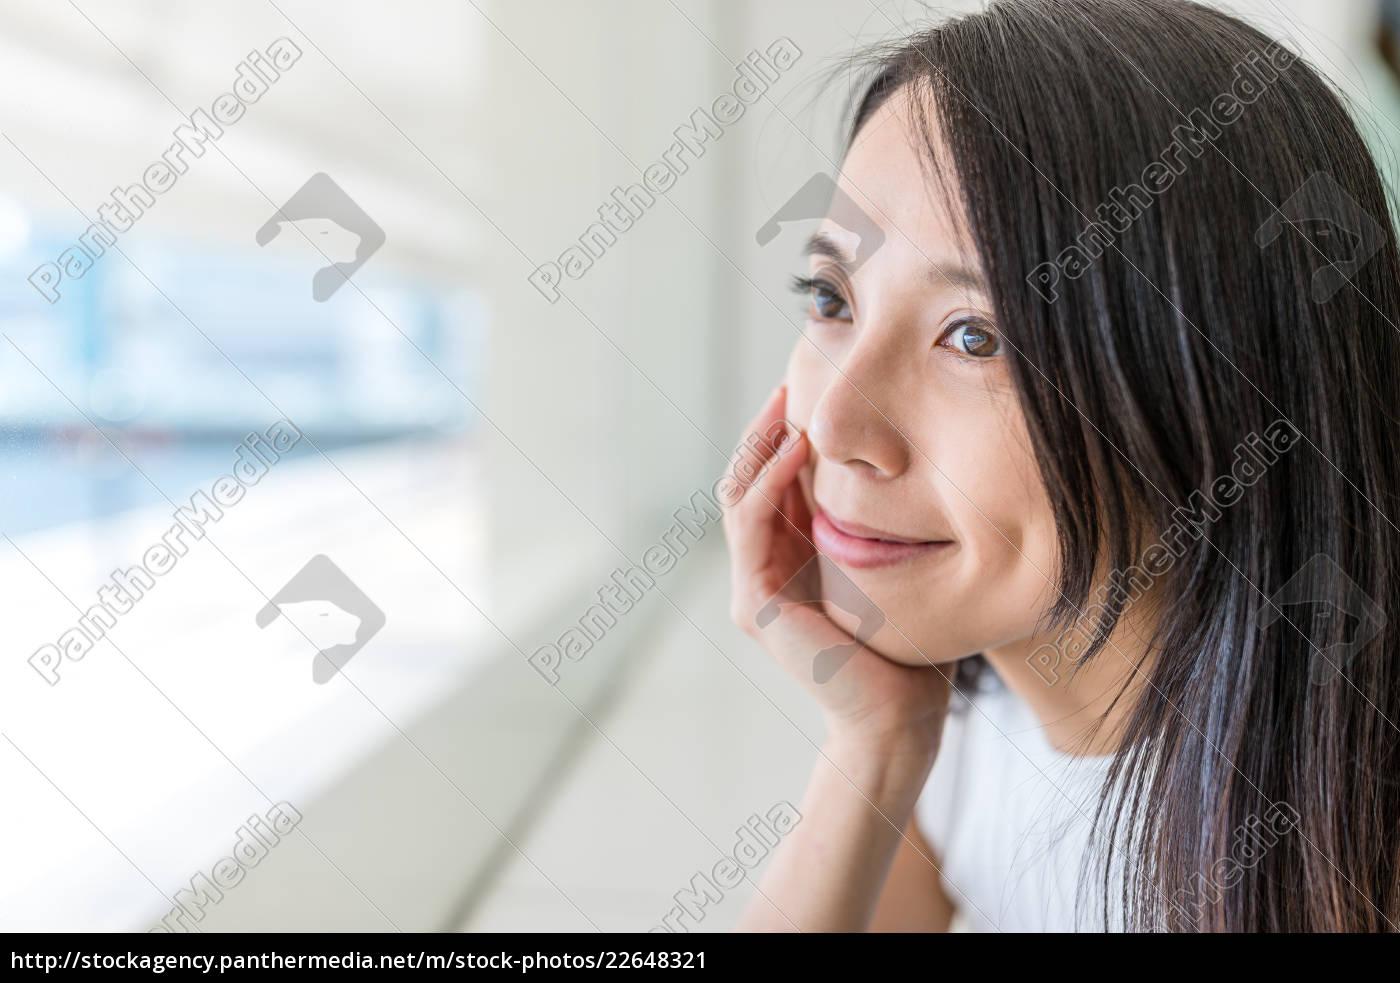 woman, looking, far, away - 22648321